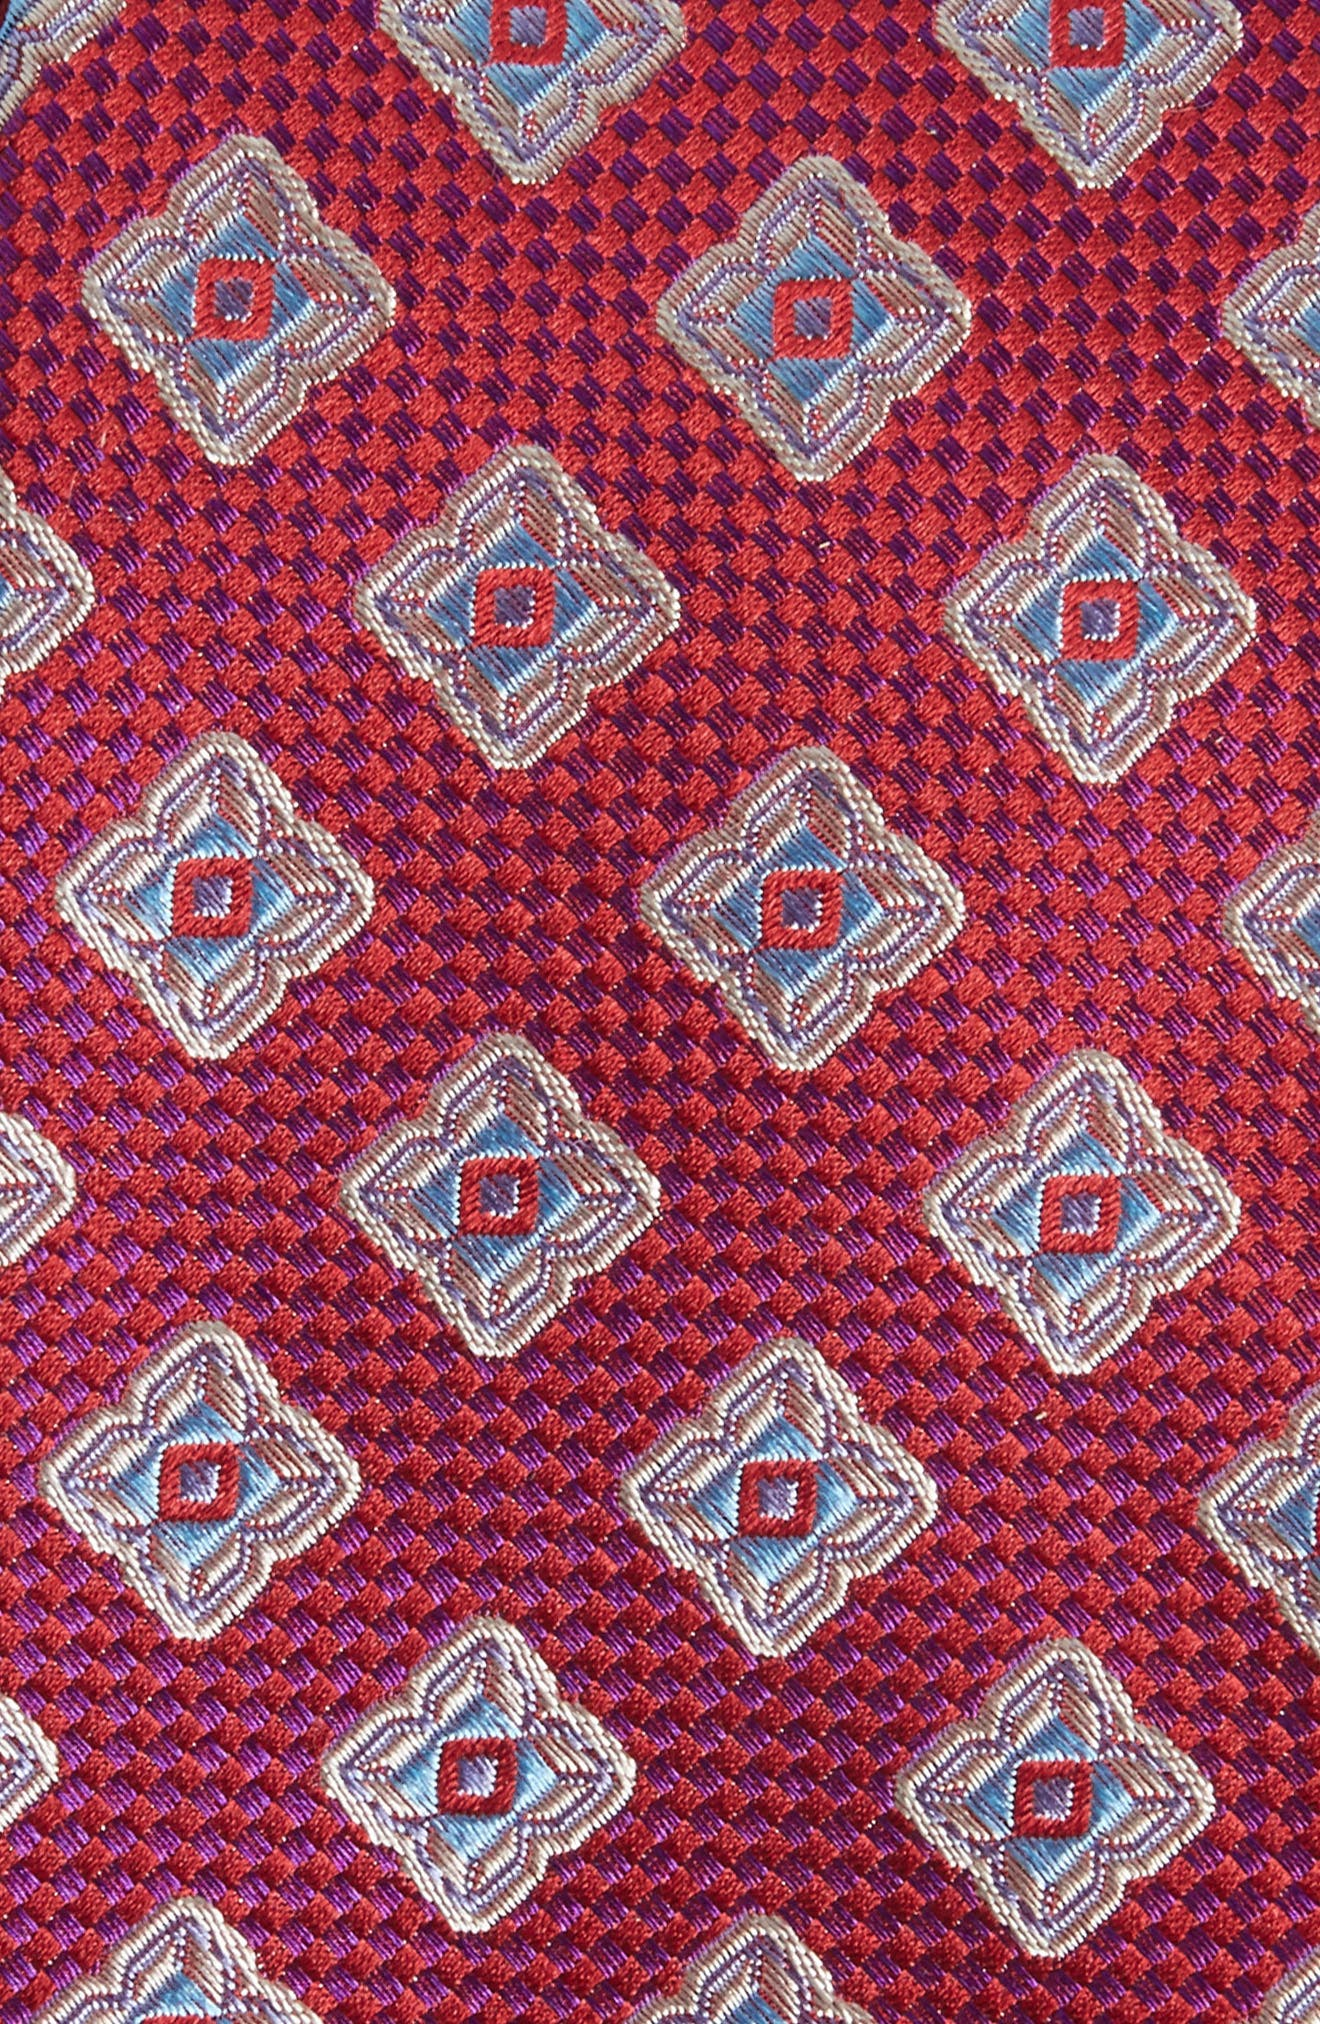 Ethan Medallion Silk Tie,                             Alternate thumbnail 2, color,                             Fuchsia